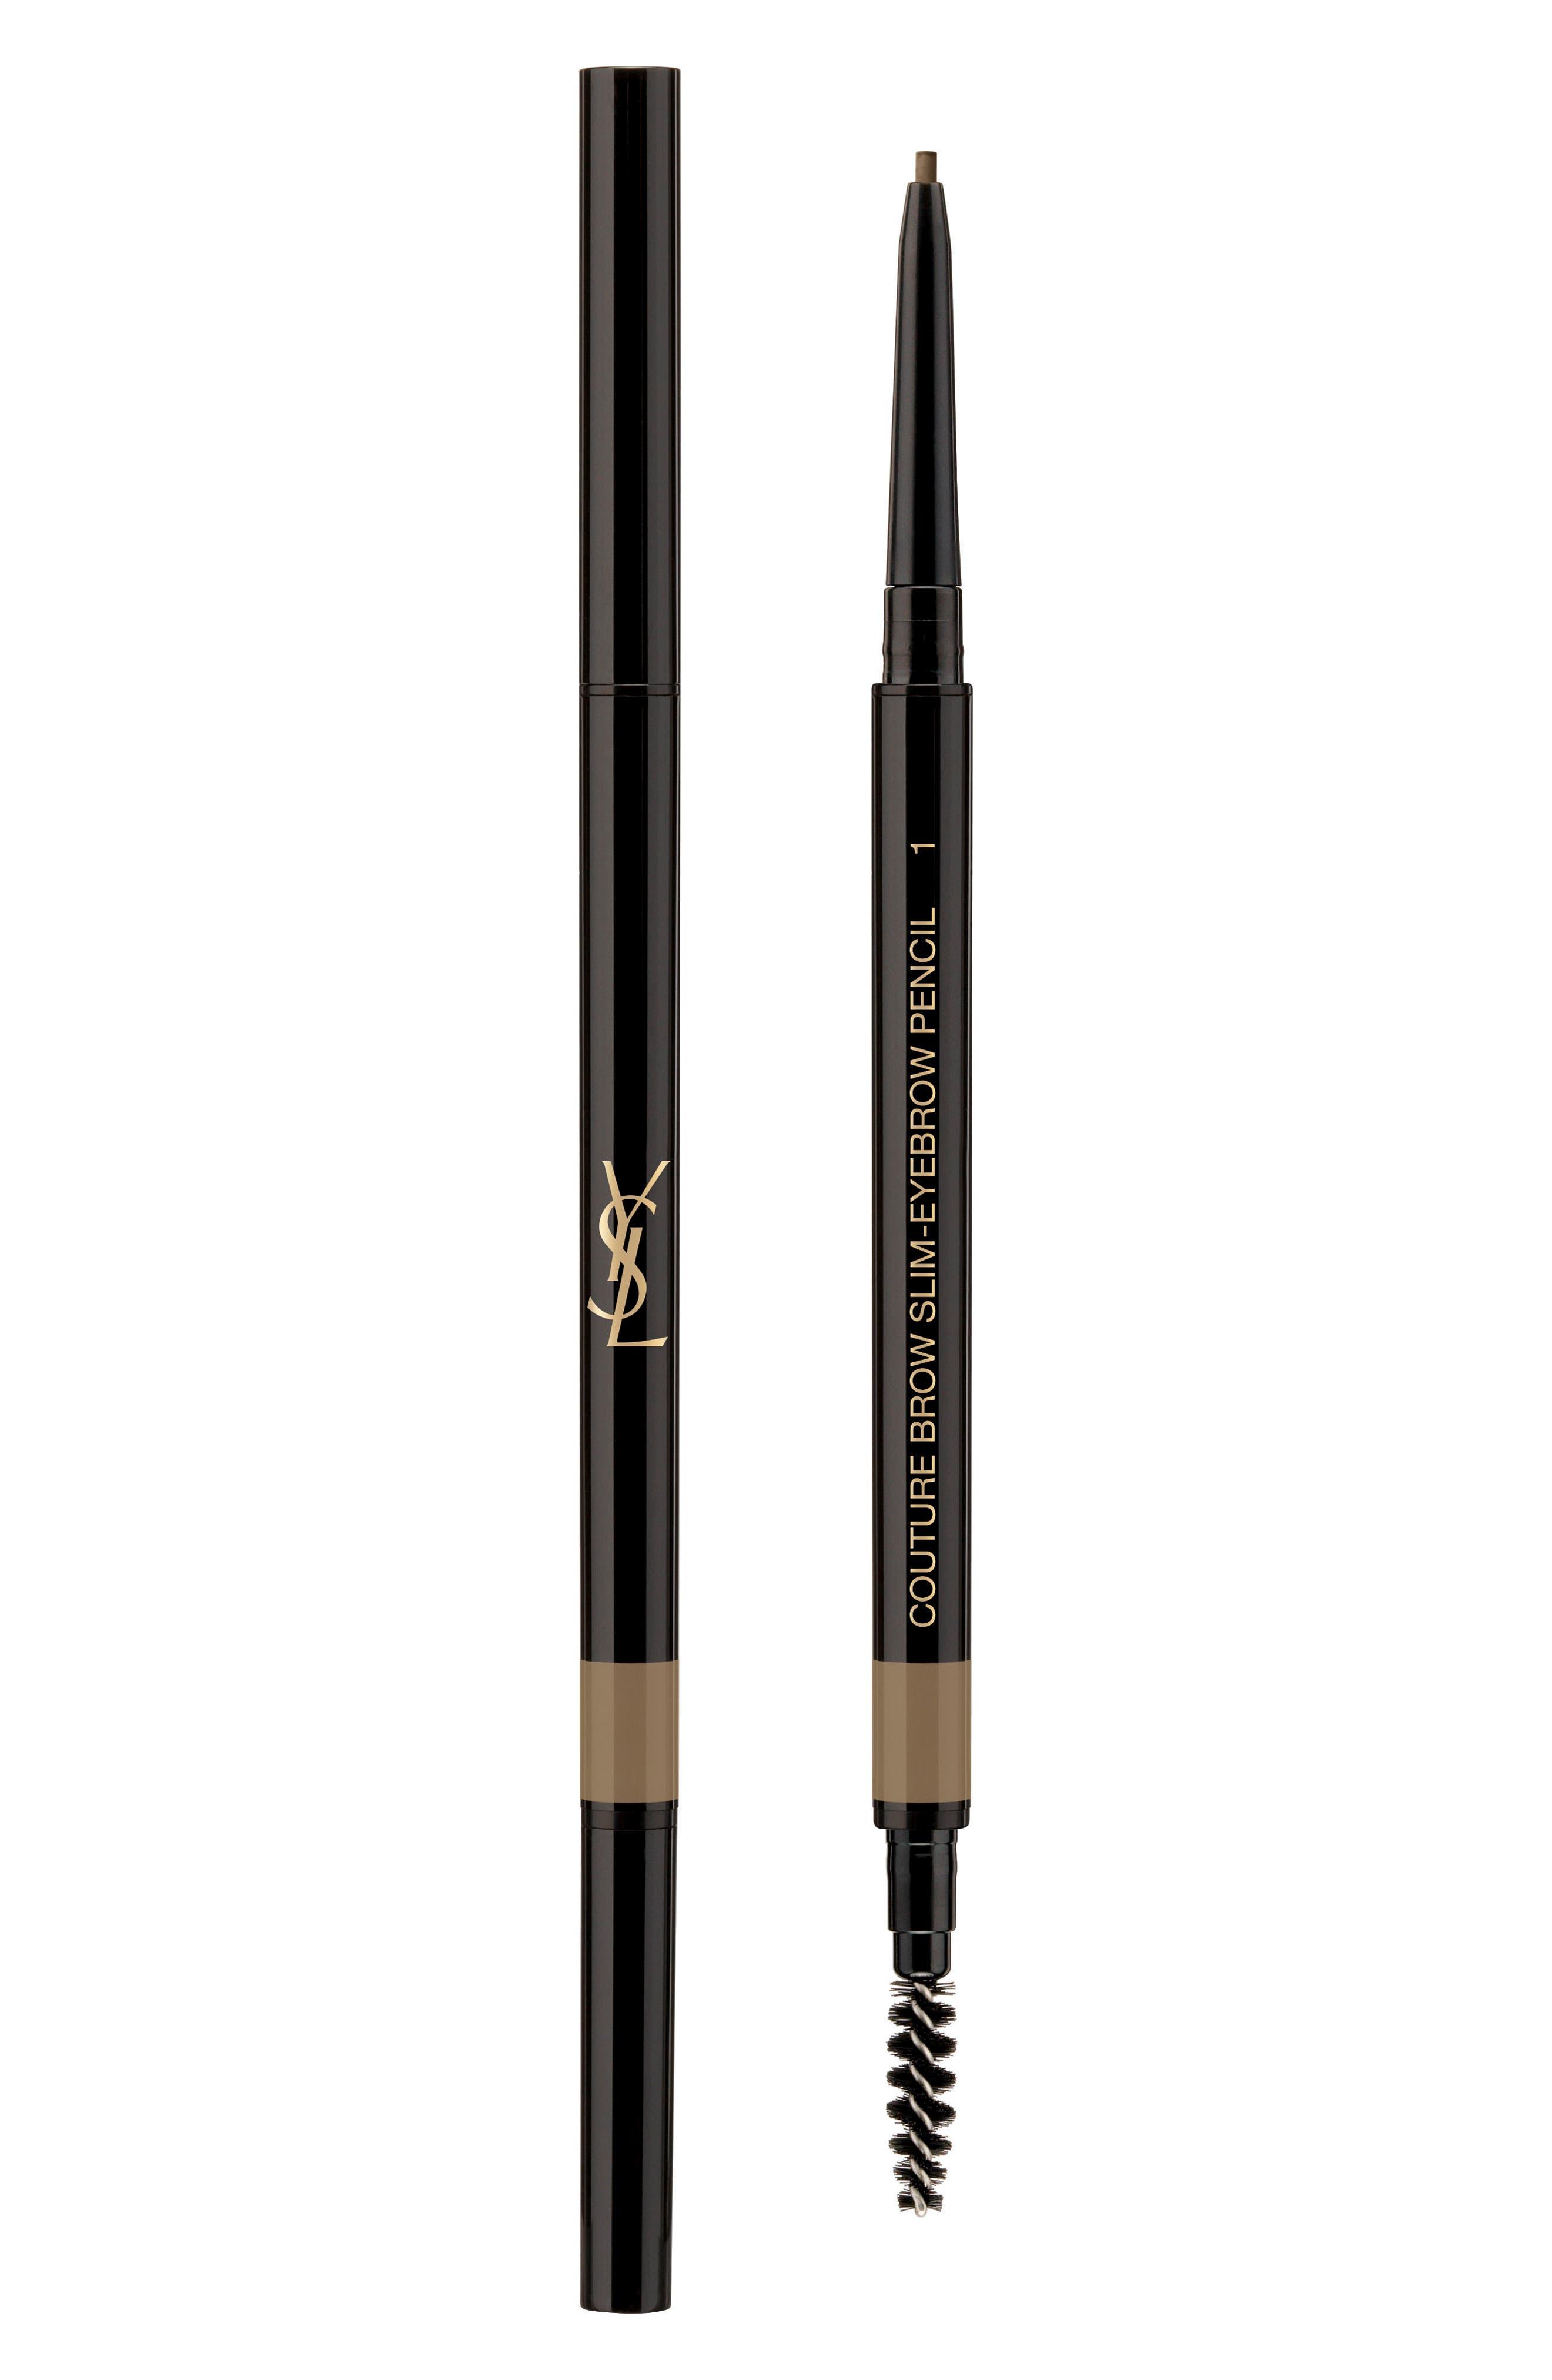 YVES SAINT LAURENT Couture Brow Slim Eyebrow Pencil, Main, color, 01 ASH BROWN